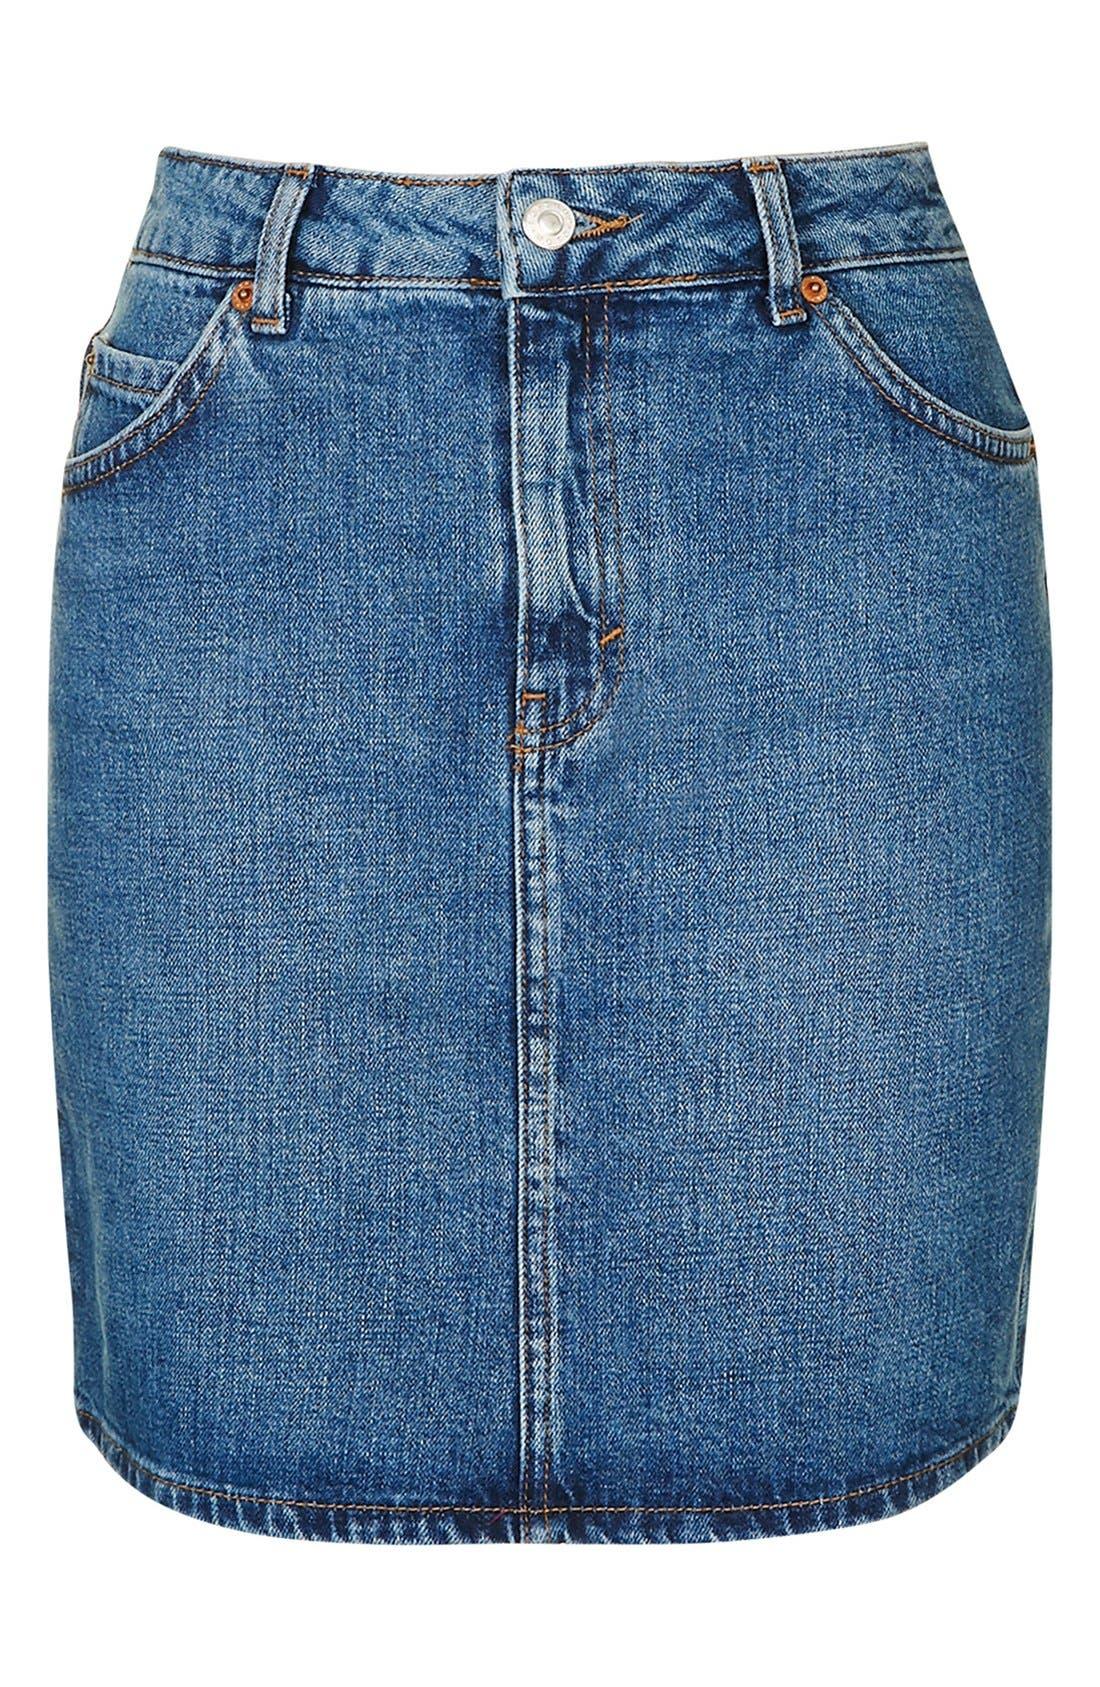 Alternate Image 4  - Topshop Moto High Rise Denim Skirt